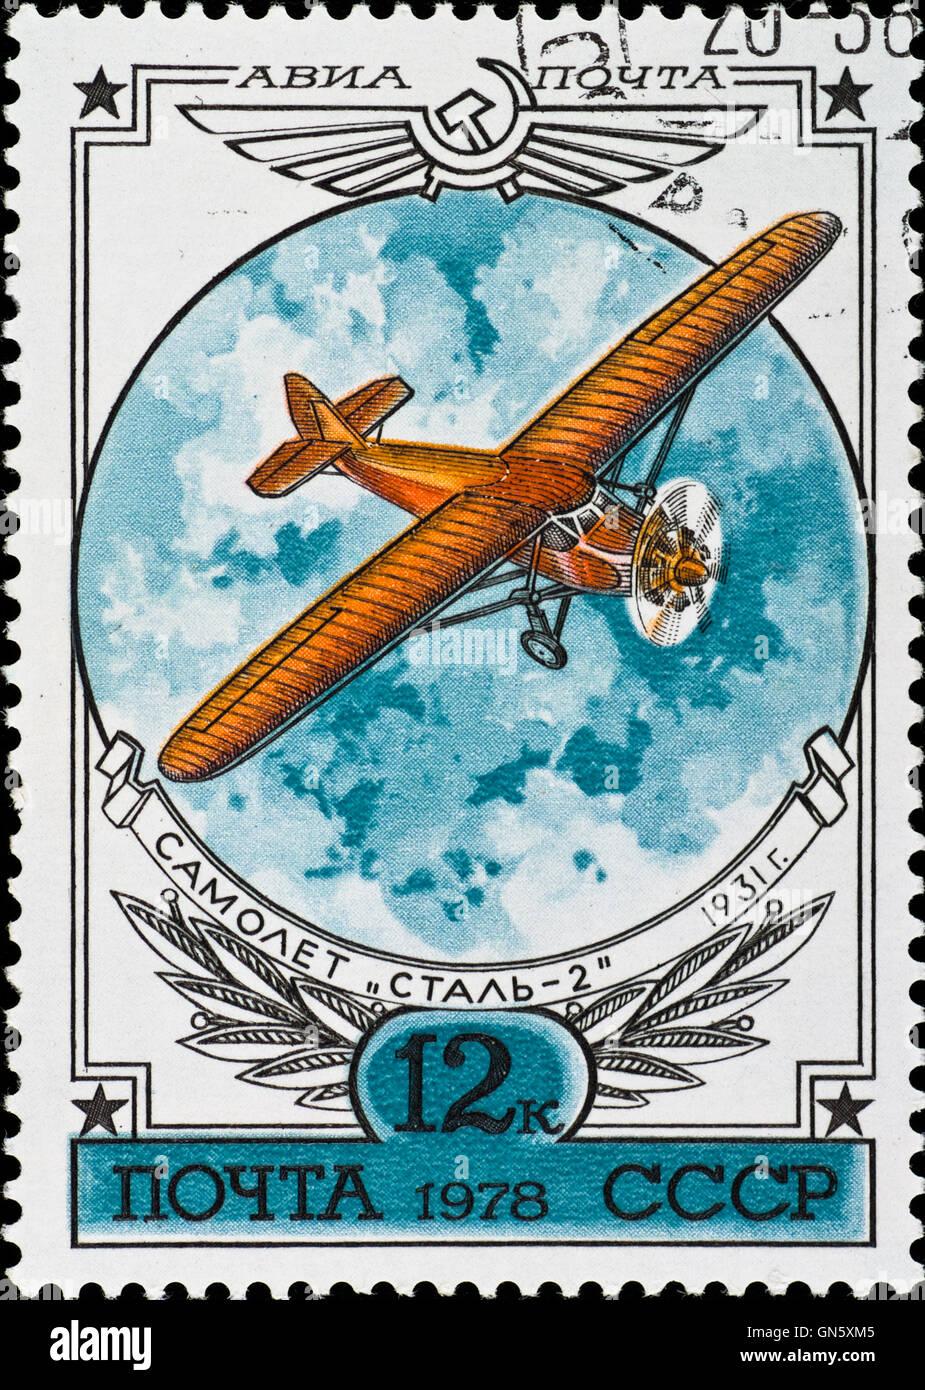 postage stamp shows vintage rare plane 'steel-2' - Stock Image